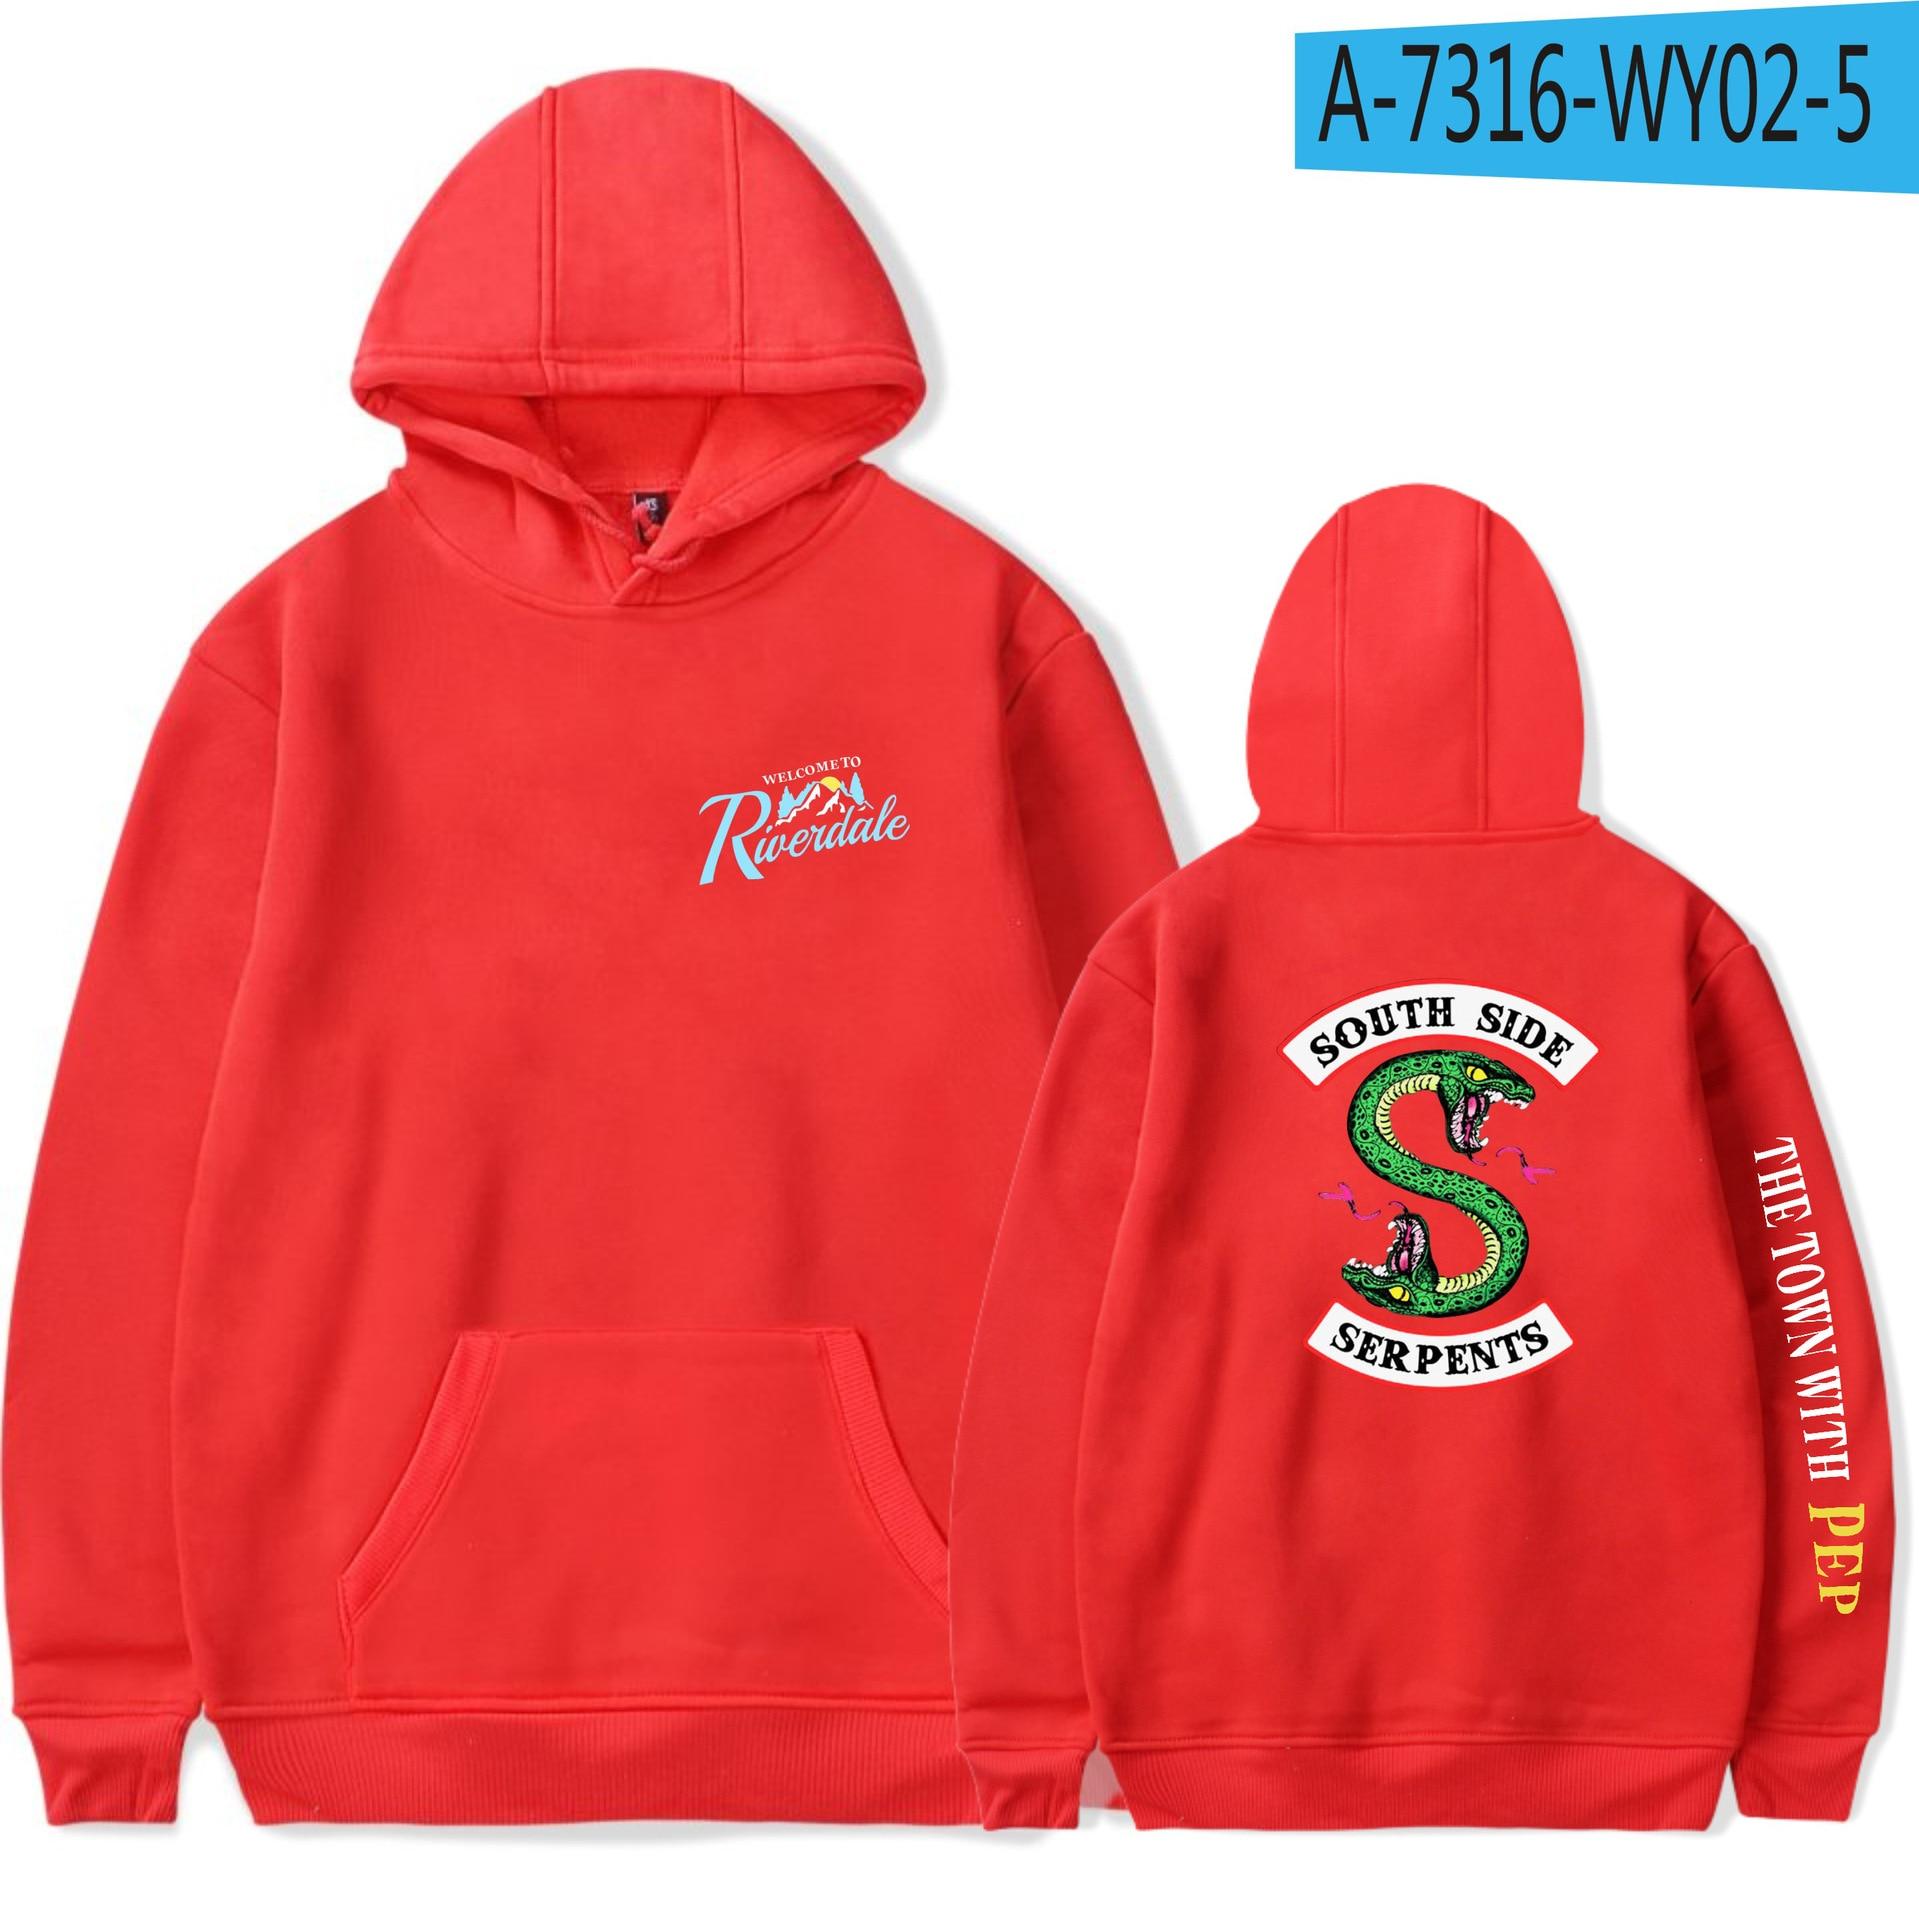 BTS Riverdale Hooded Sweatshirt Men Women Long Sleeve Fashion Hoodies Sweatshirt Casual Pink Hoodies Plus Size Pullover XXS-4XL